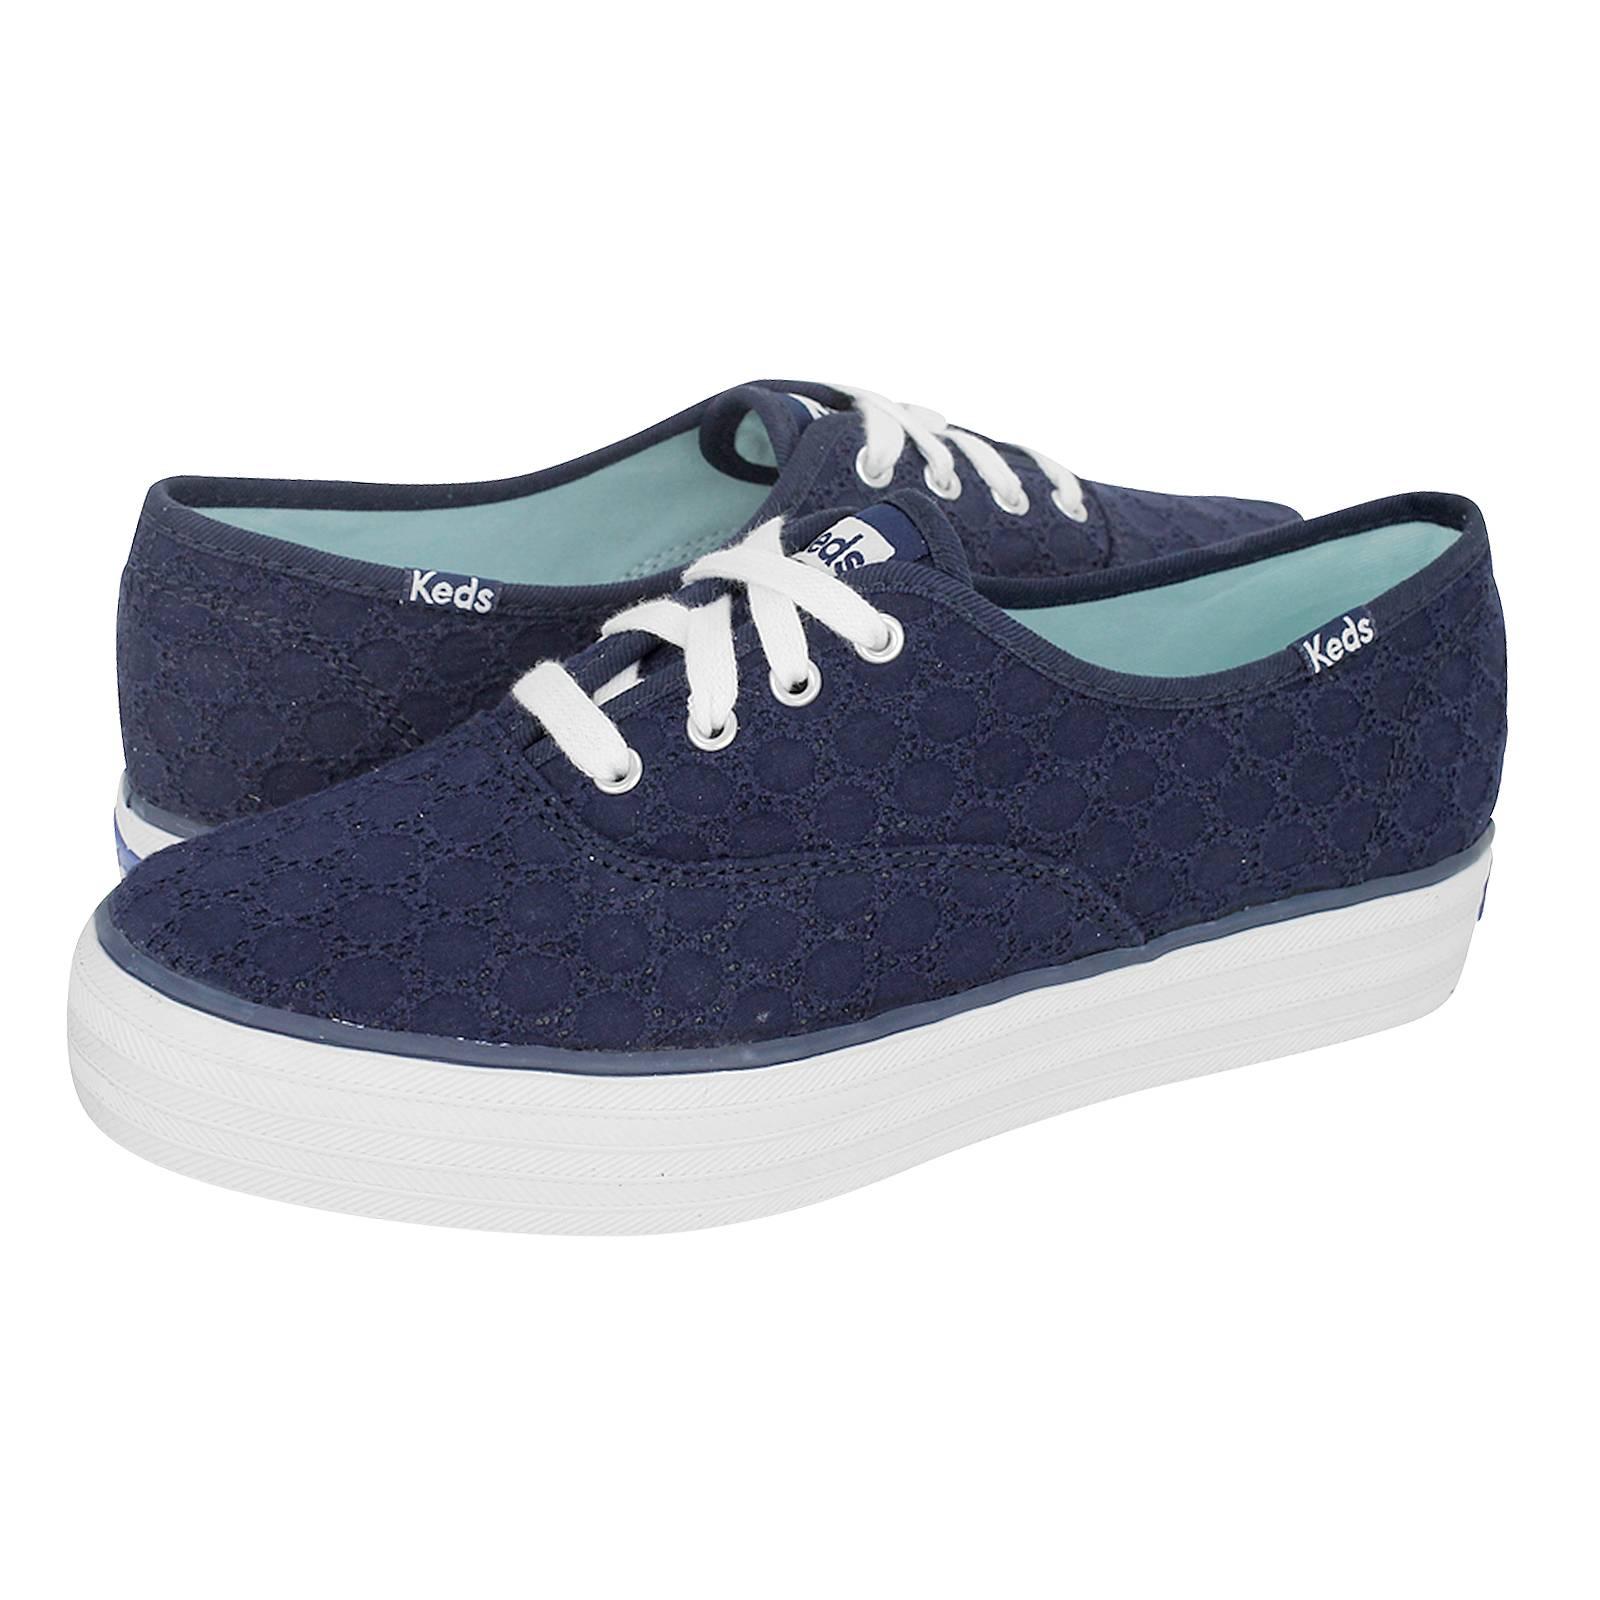 Triple Eyelet - Γυναικεία παπούτσια casual Keds από υφασμα - Gianna ... 47e212d8330